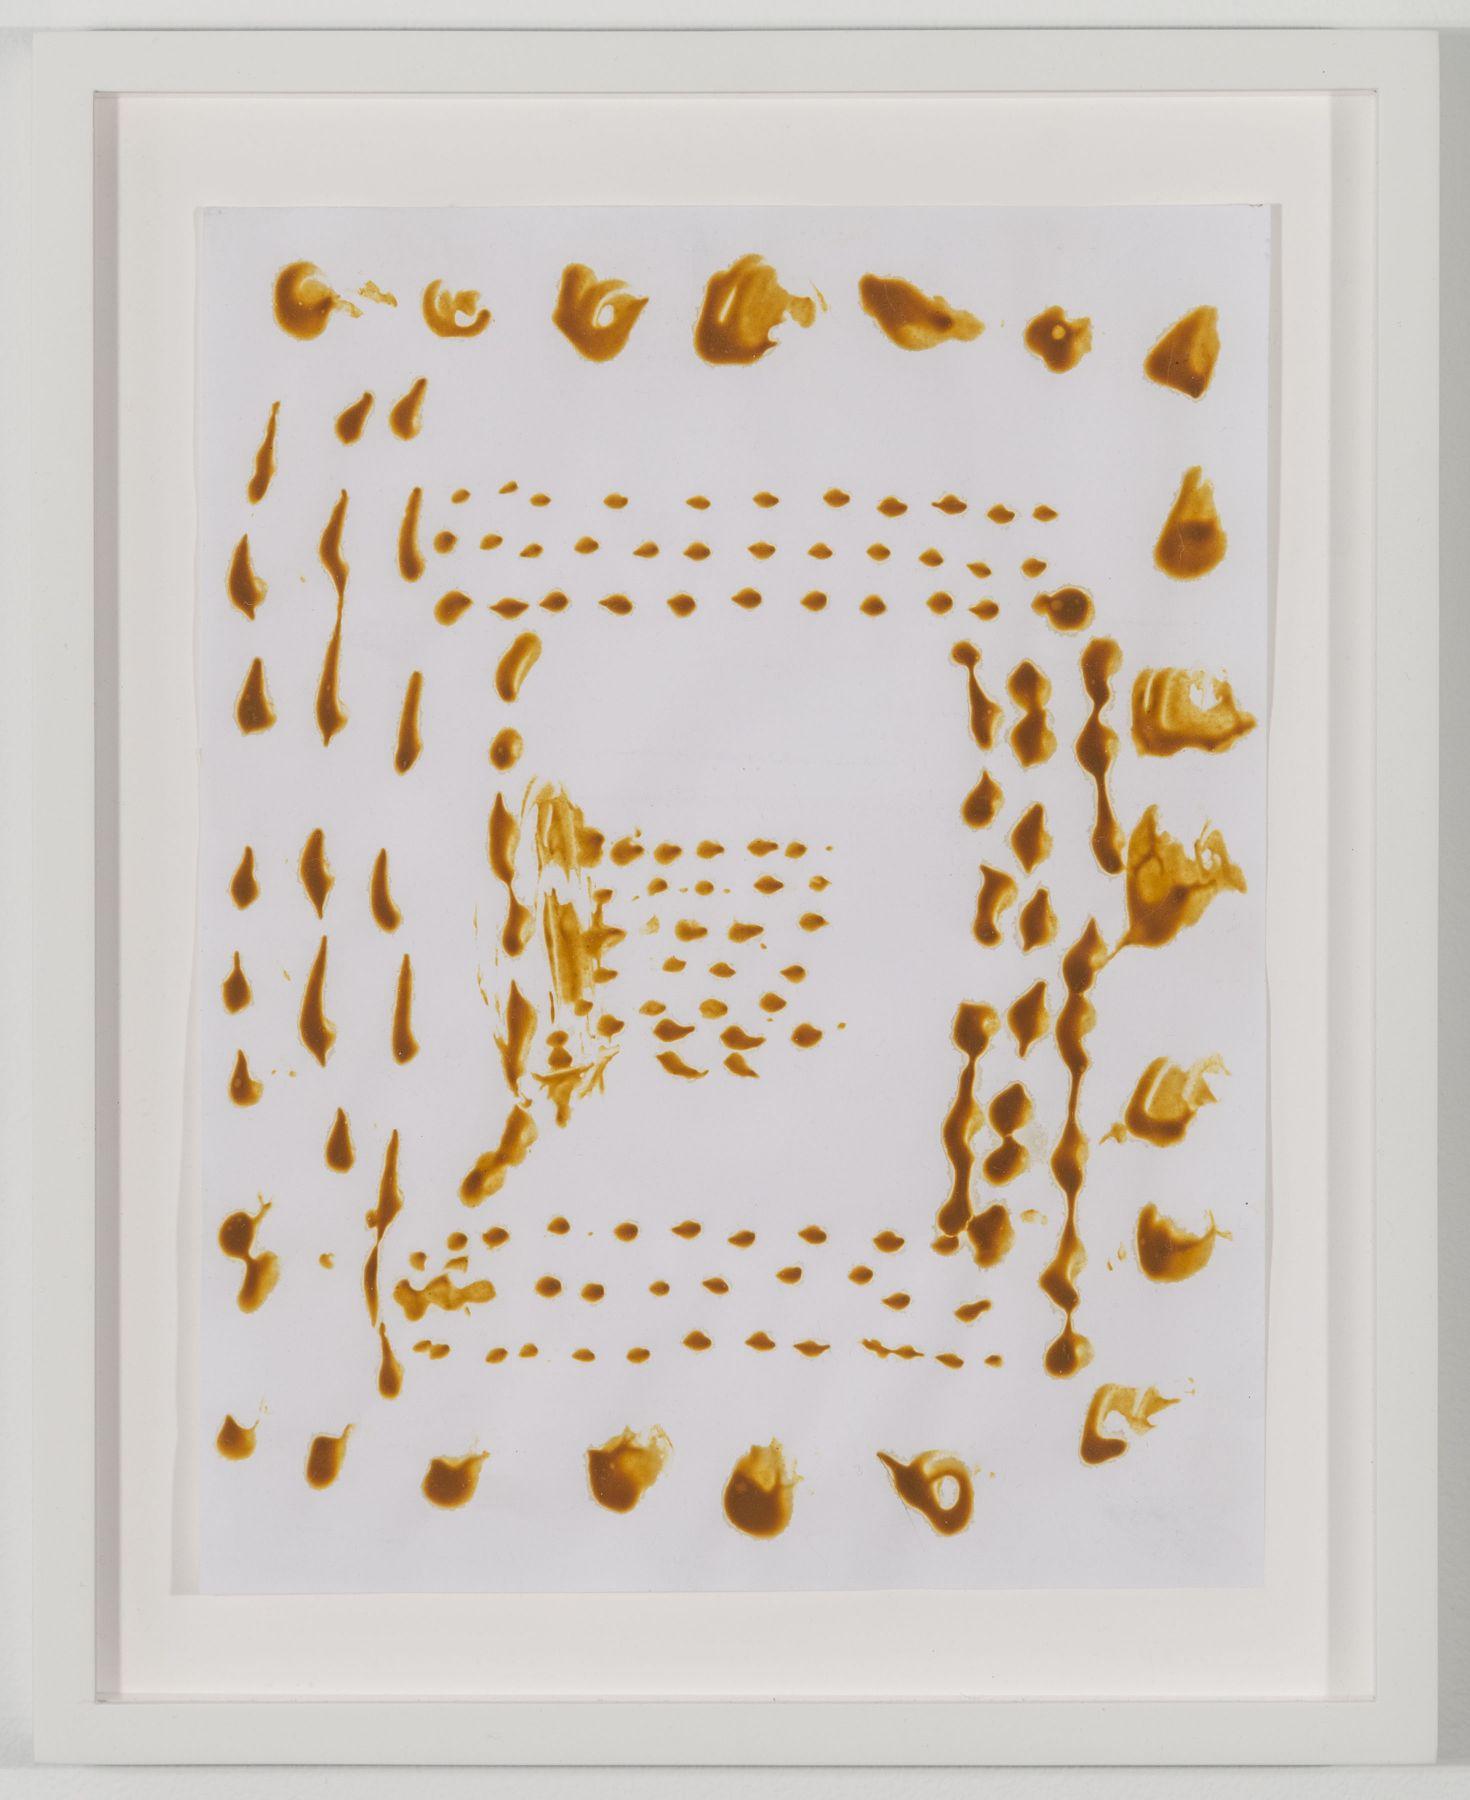 BRIAN BELOTT, Mustard Drawing (Dots),2015